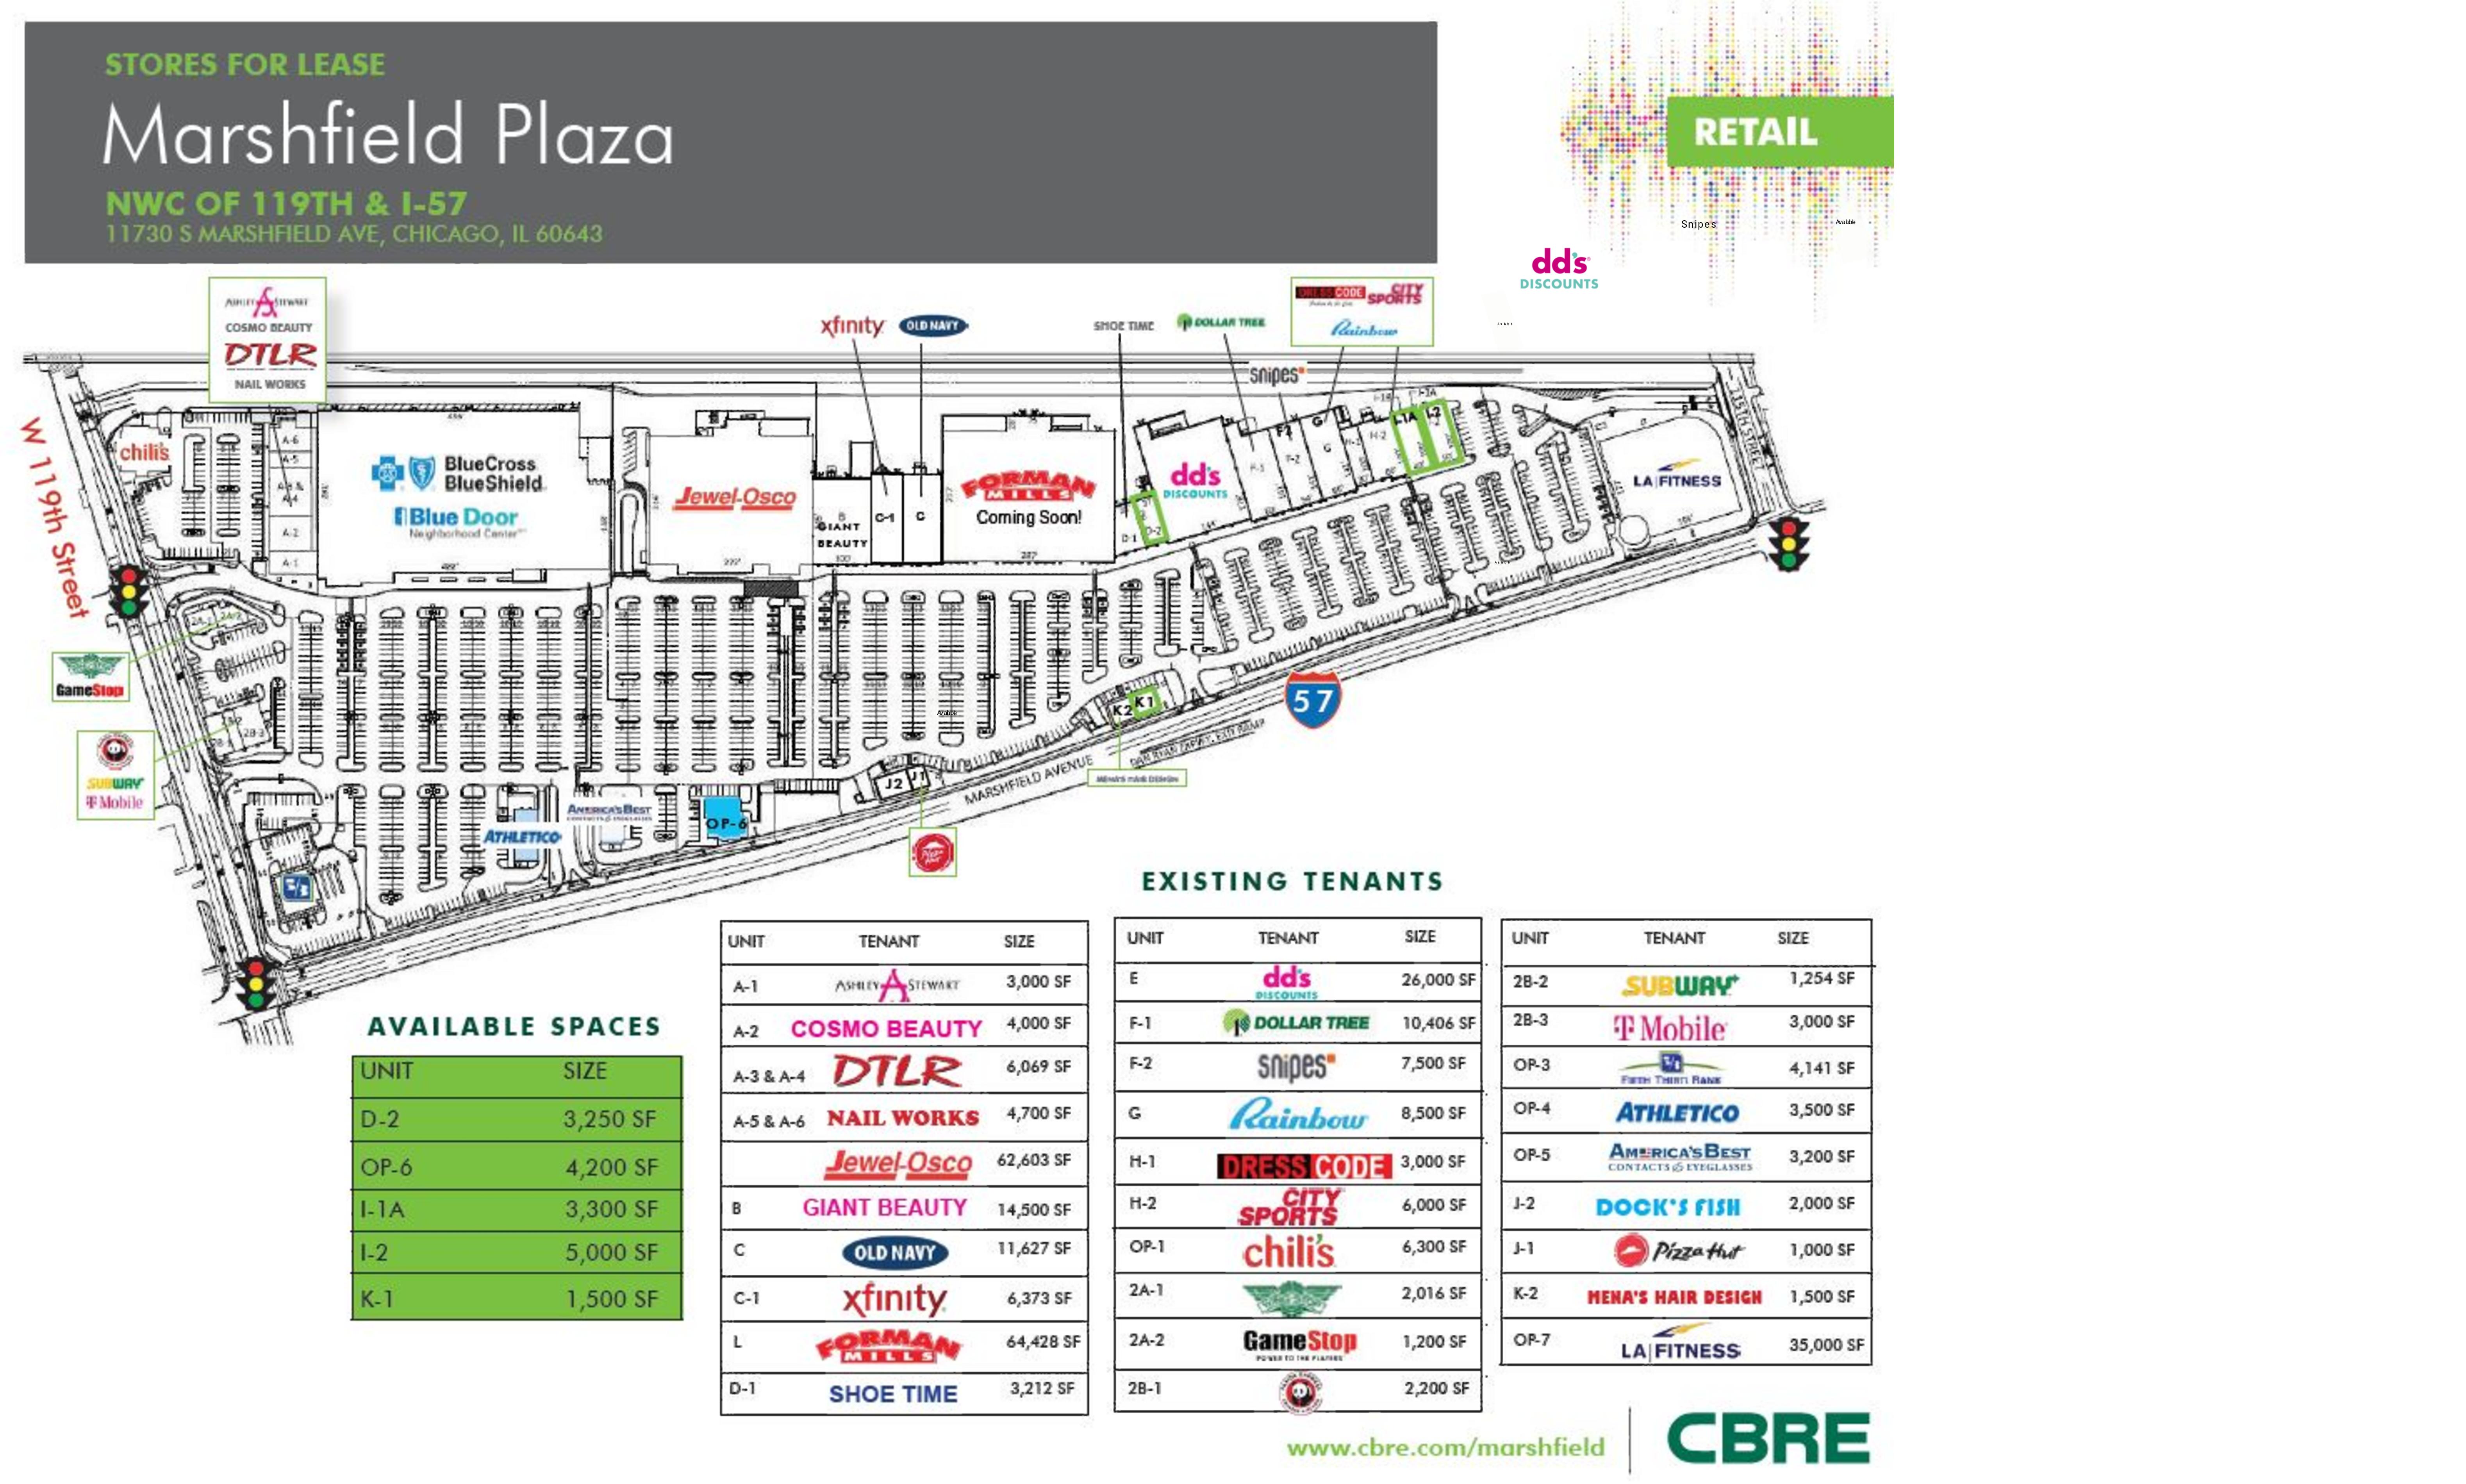 Marshfield Plaza: site plan